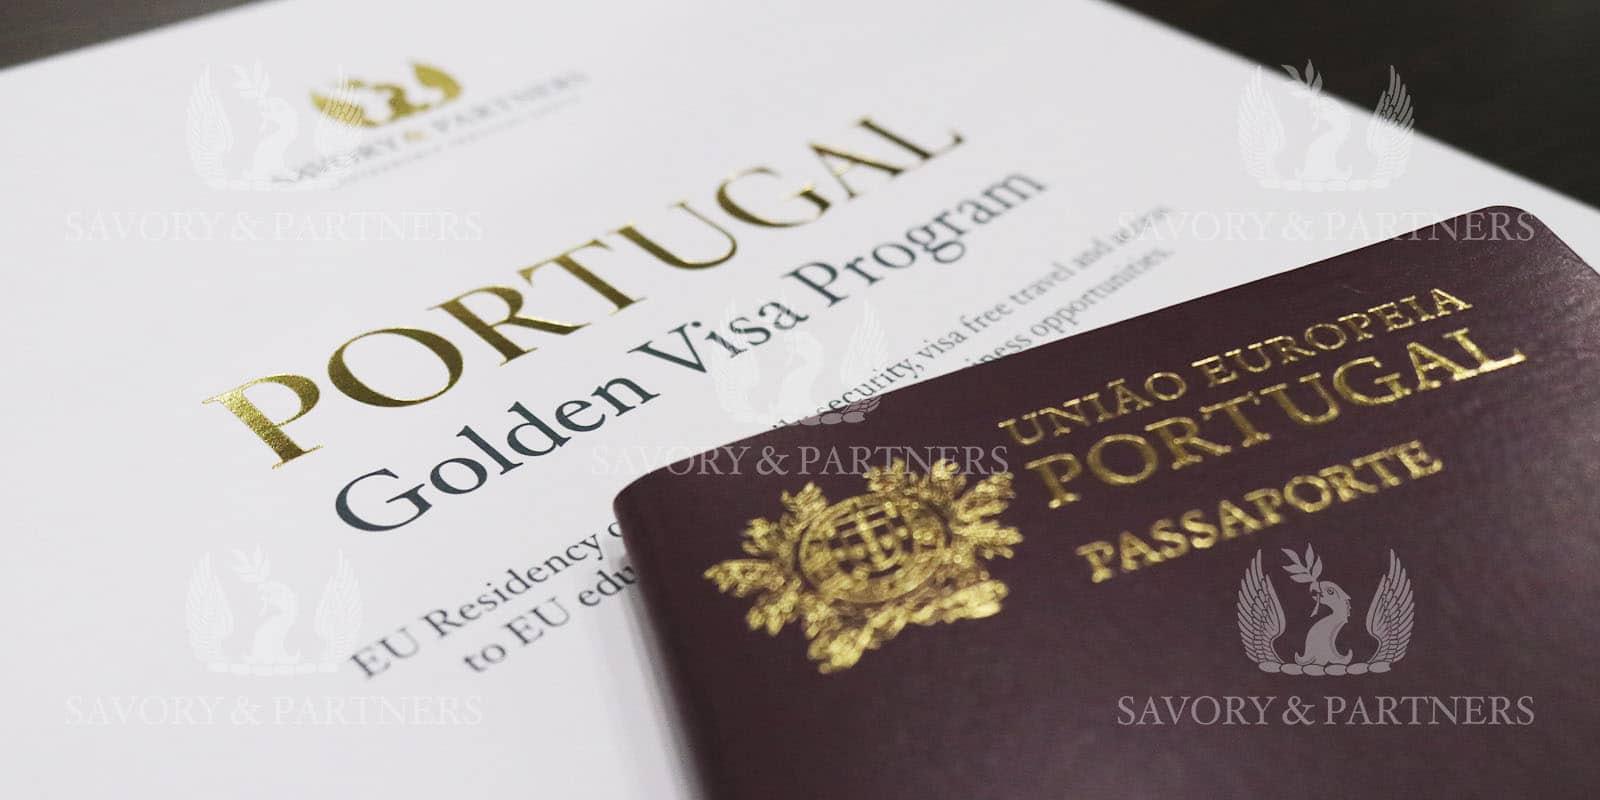 Portugal passport at Savory & Partners office in Dubai, UAE